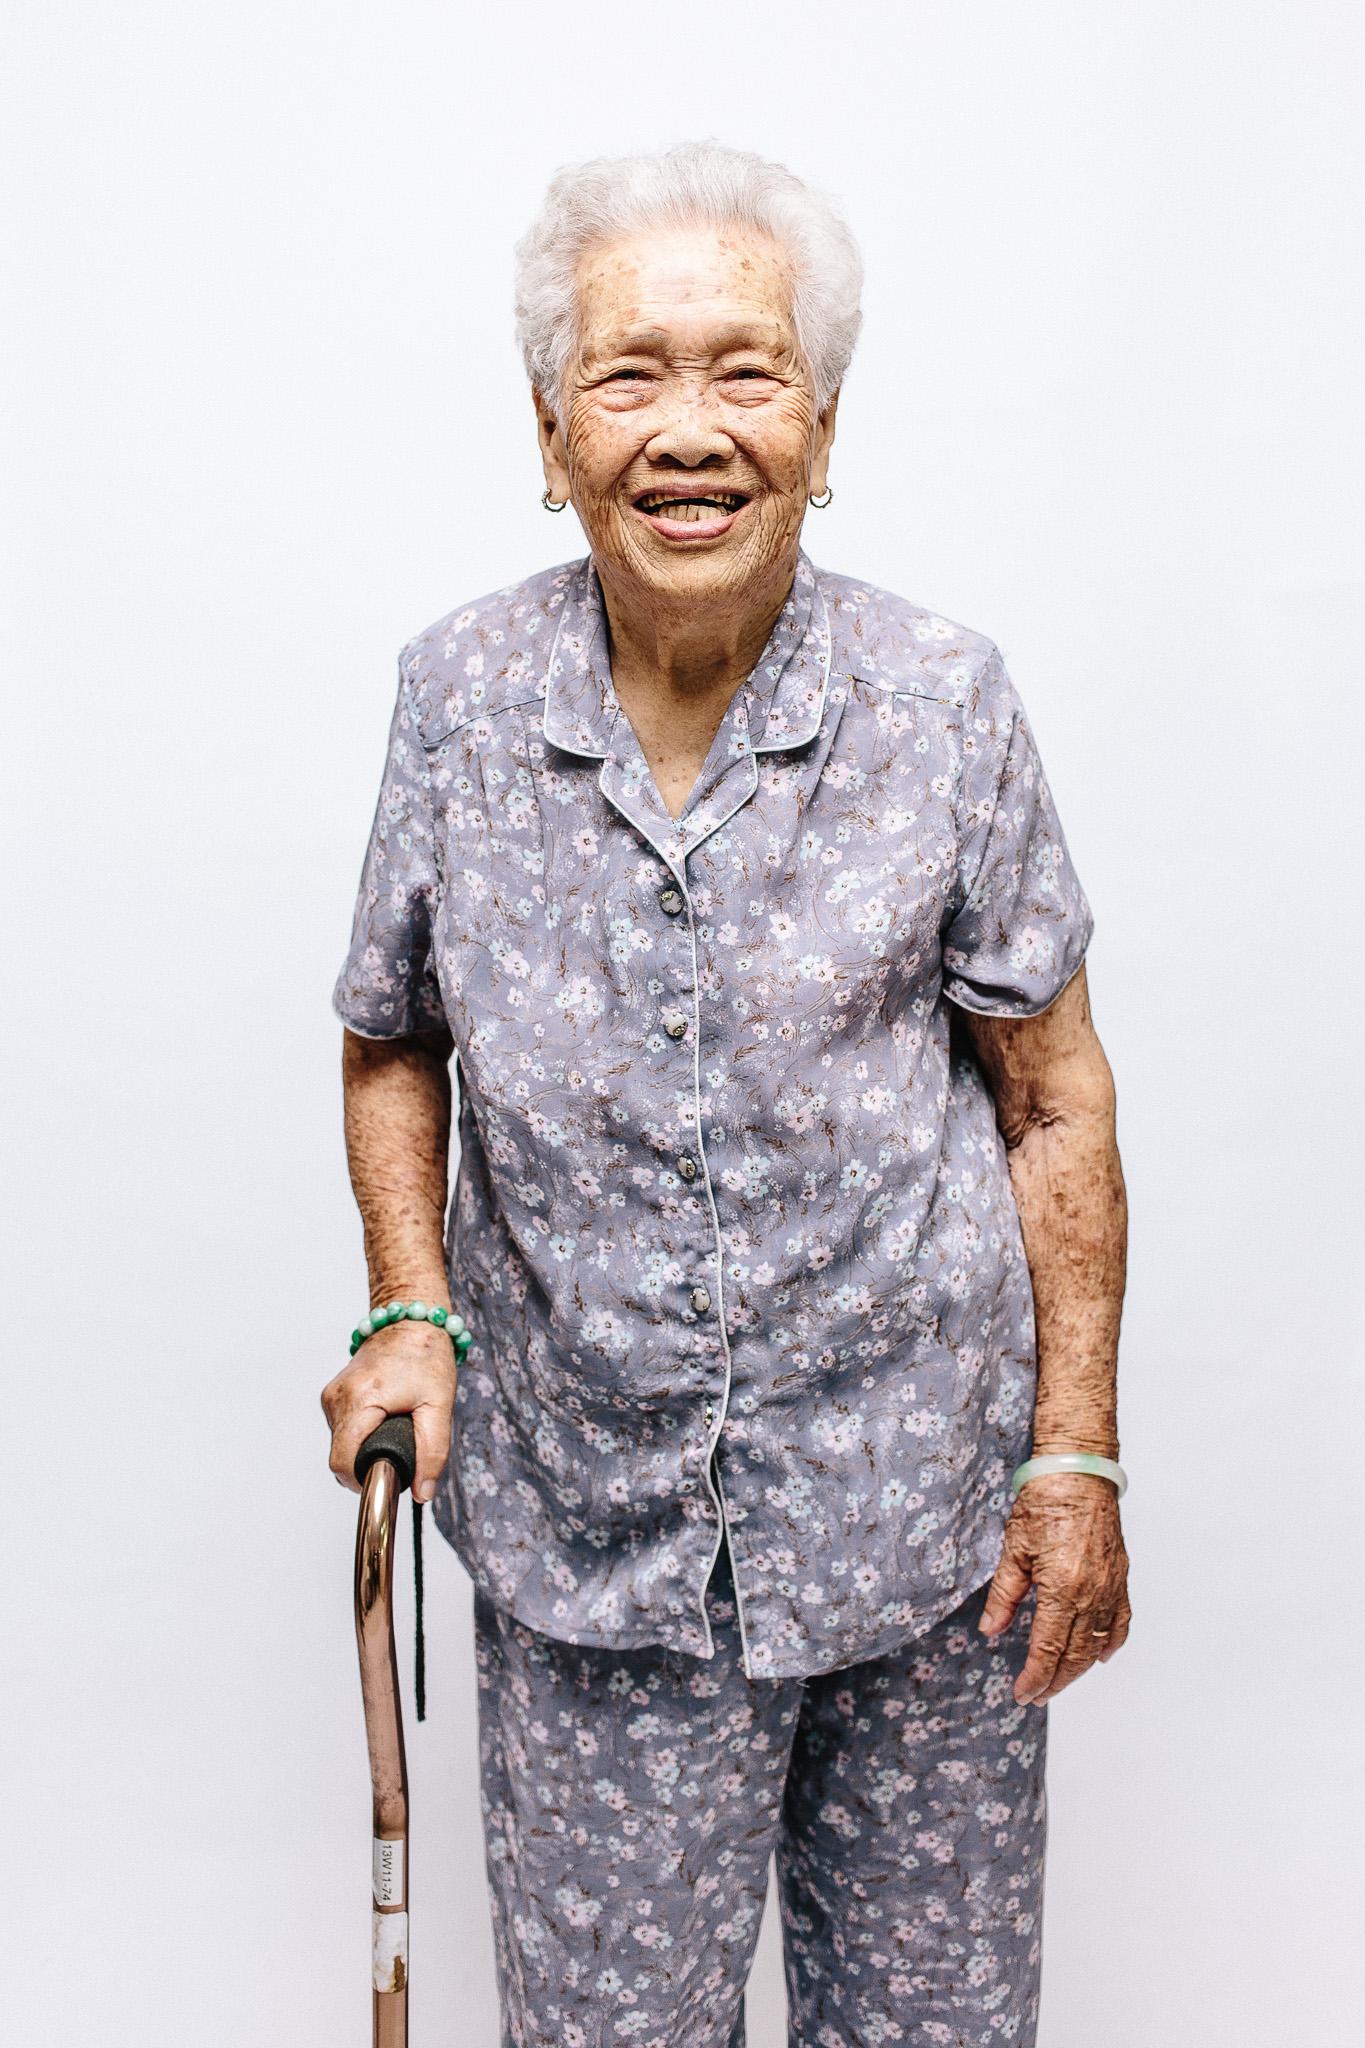 zainal-zainal-studio-centenarians-care-duke-nus-singapore-photographer-04.jpg